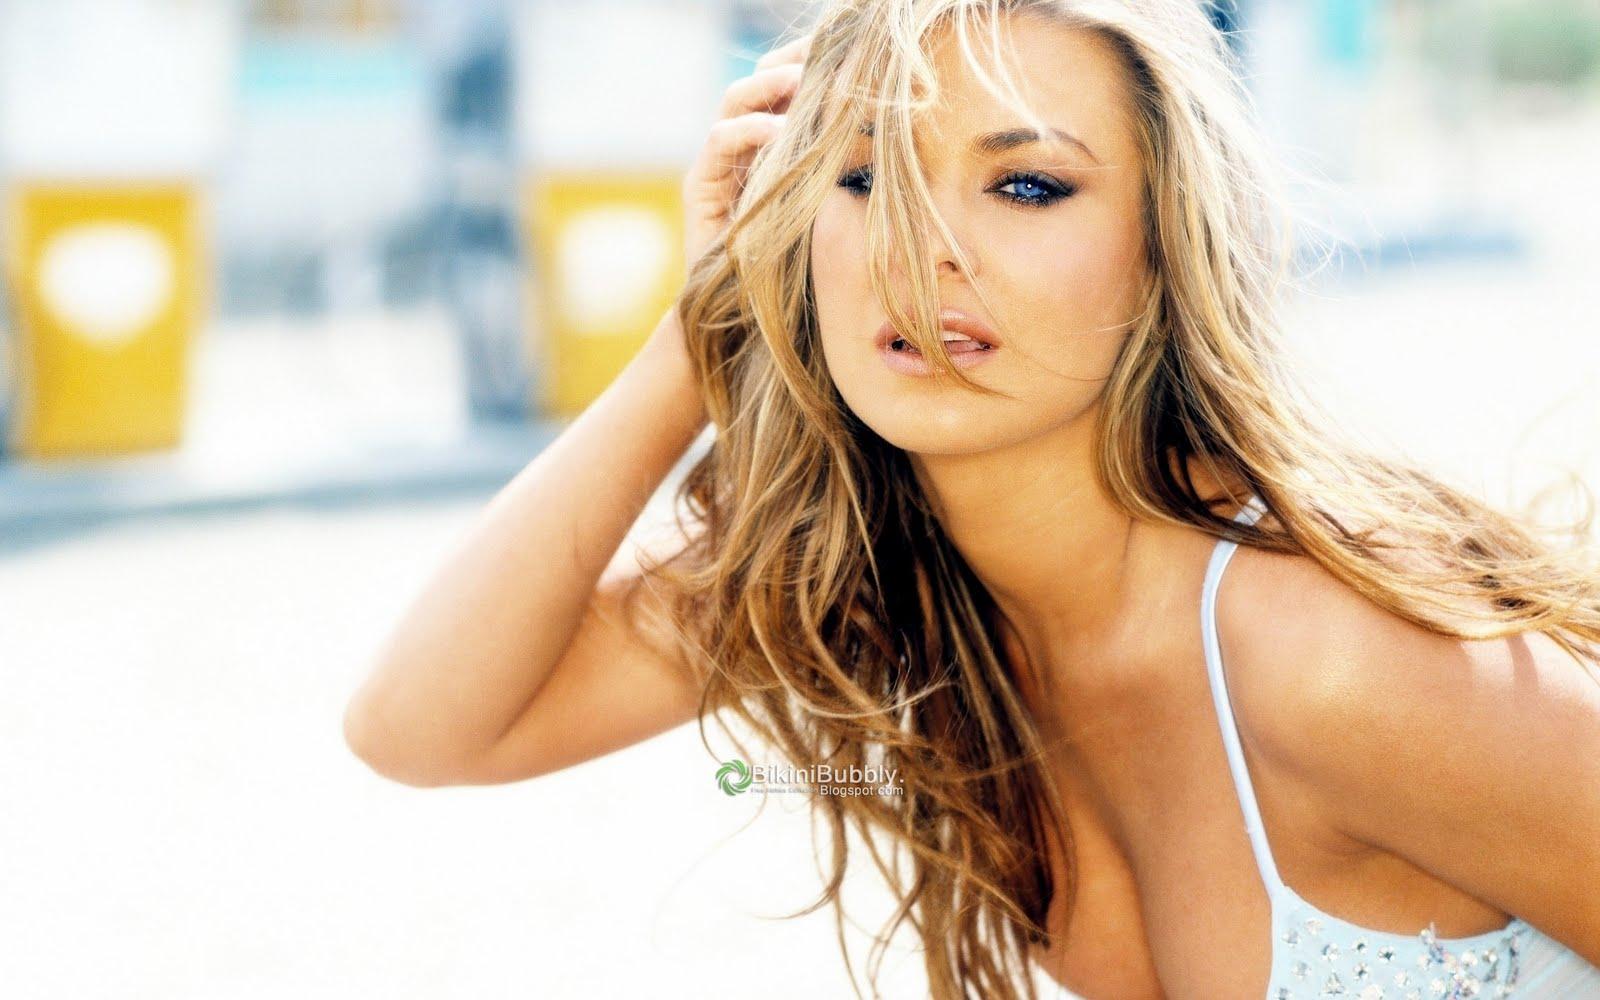 http://4.bp.blogspot.com/-ZvR8GAYlWwo/TnHS_pagDpI/AAAAAAAAKzs/al9OZuPTiqk/s1600/sexy-actress-by-bikinibubbly.blogspot.com%2B%25252843%252529.jpg